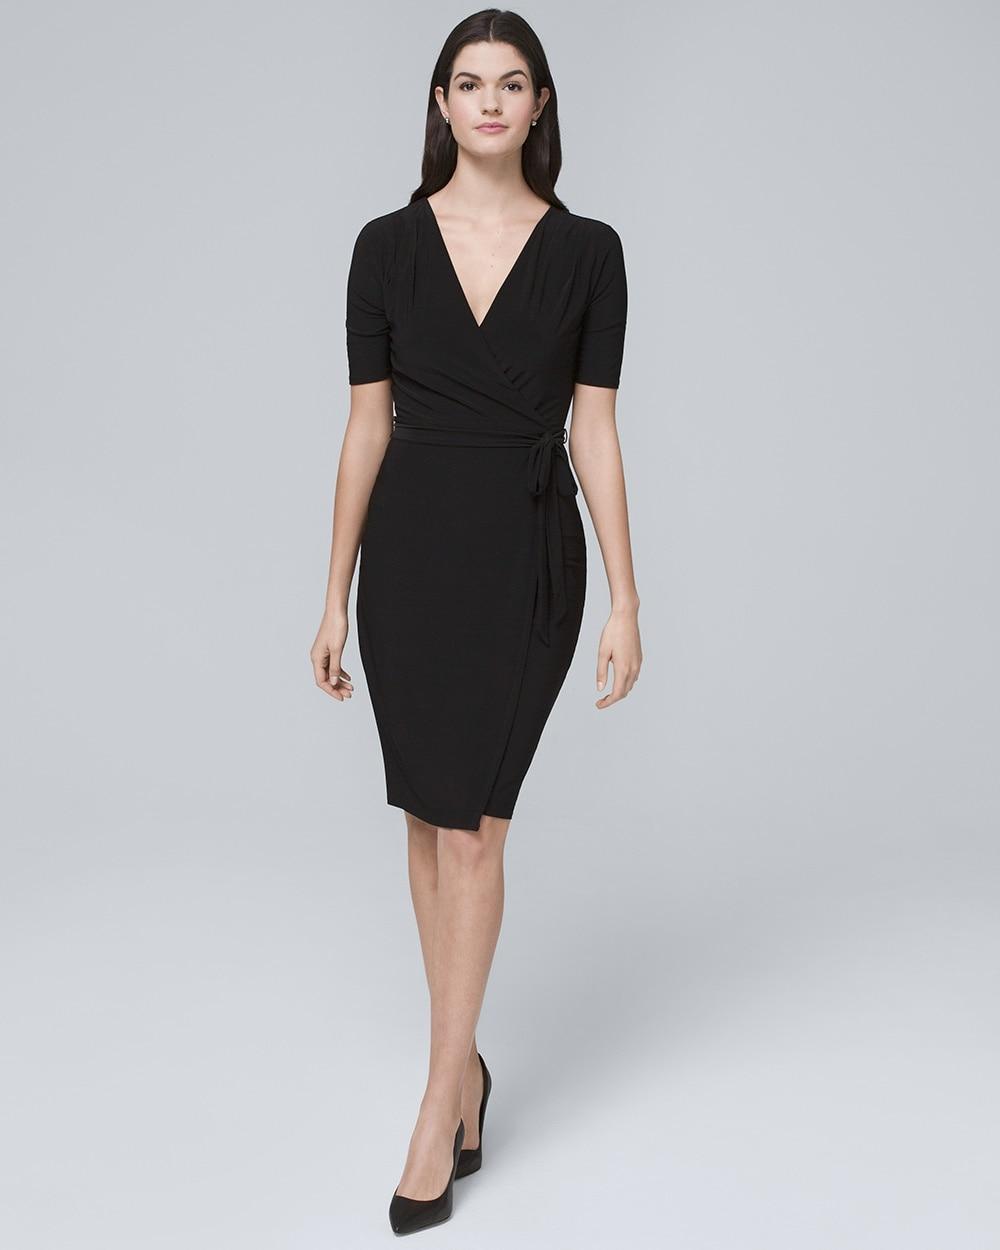 80f88d872da Black Knit Wrap Dress - White House Black Market